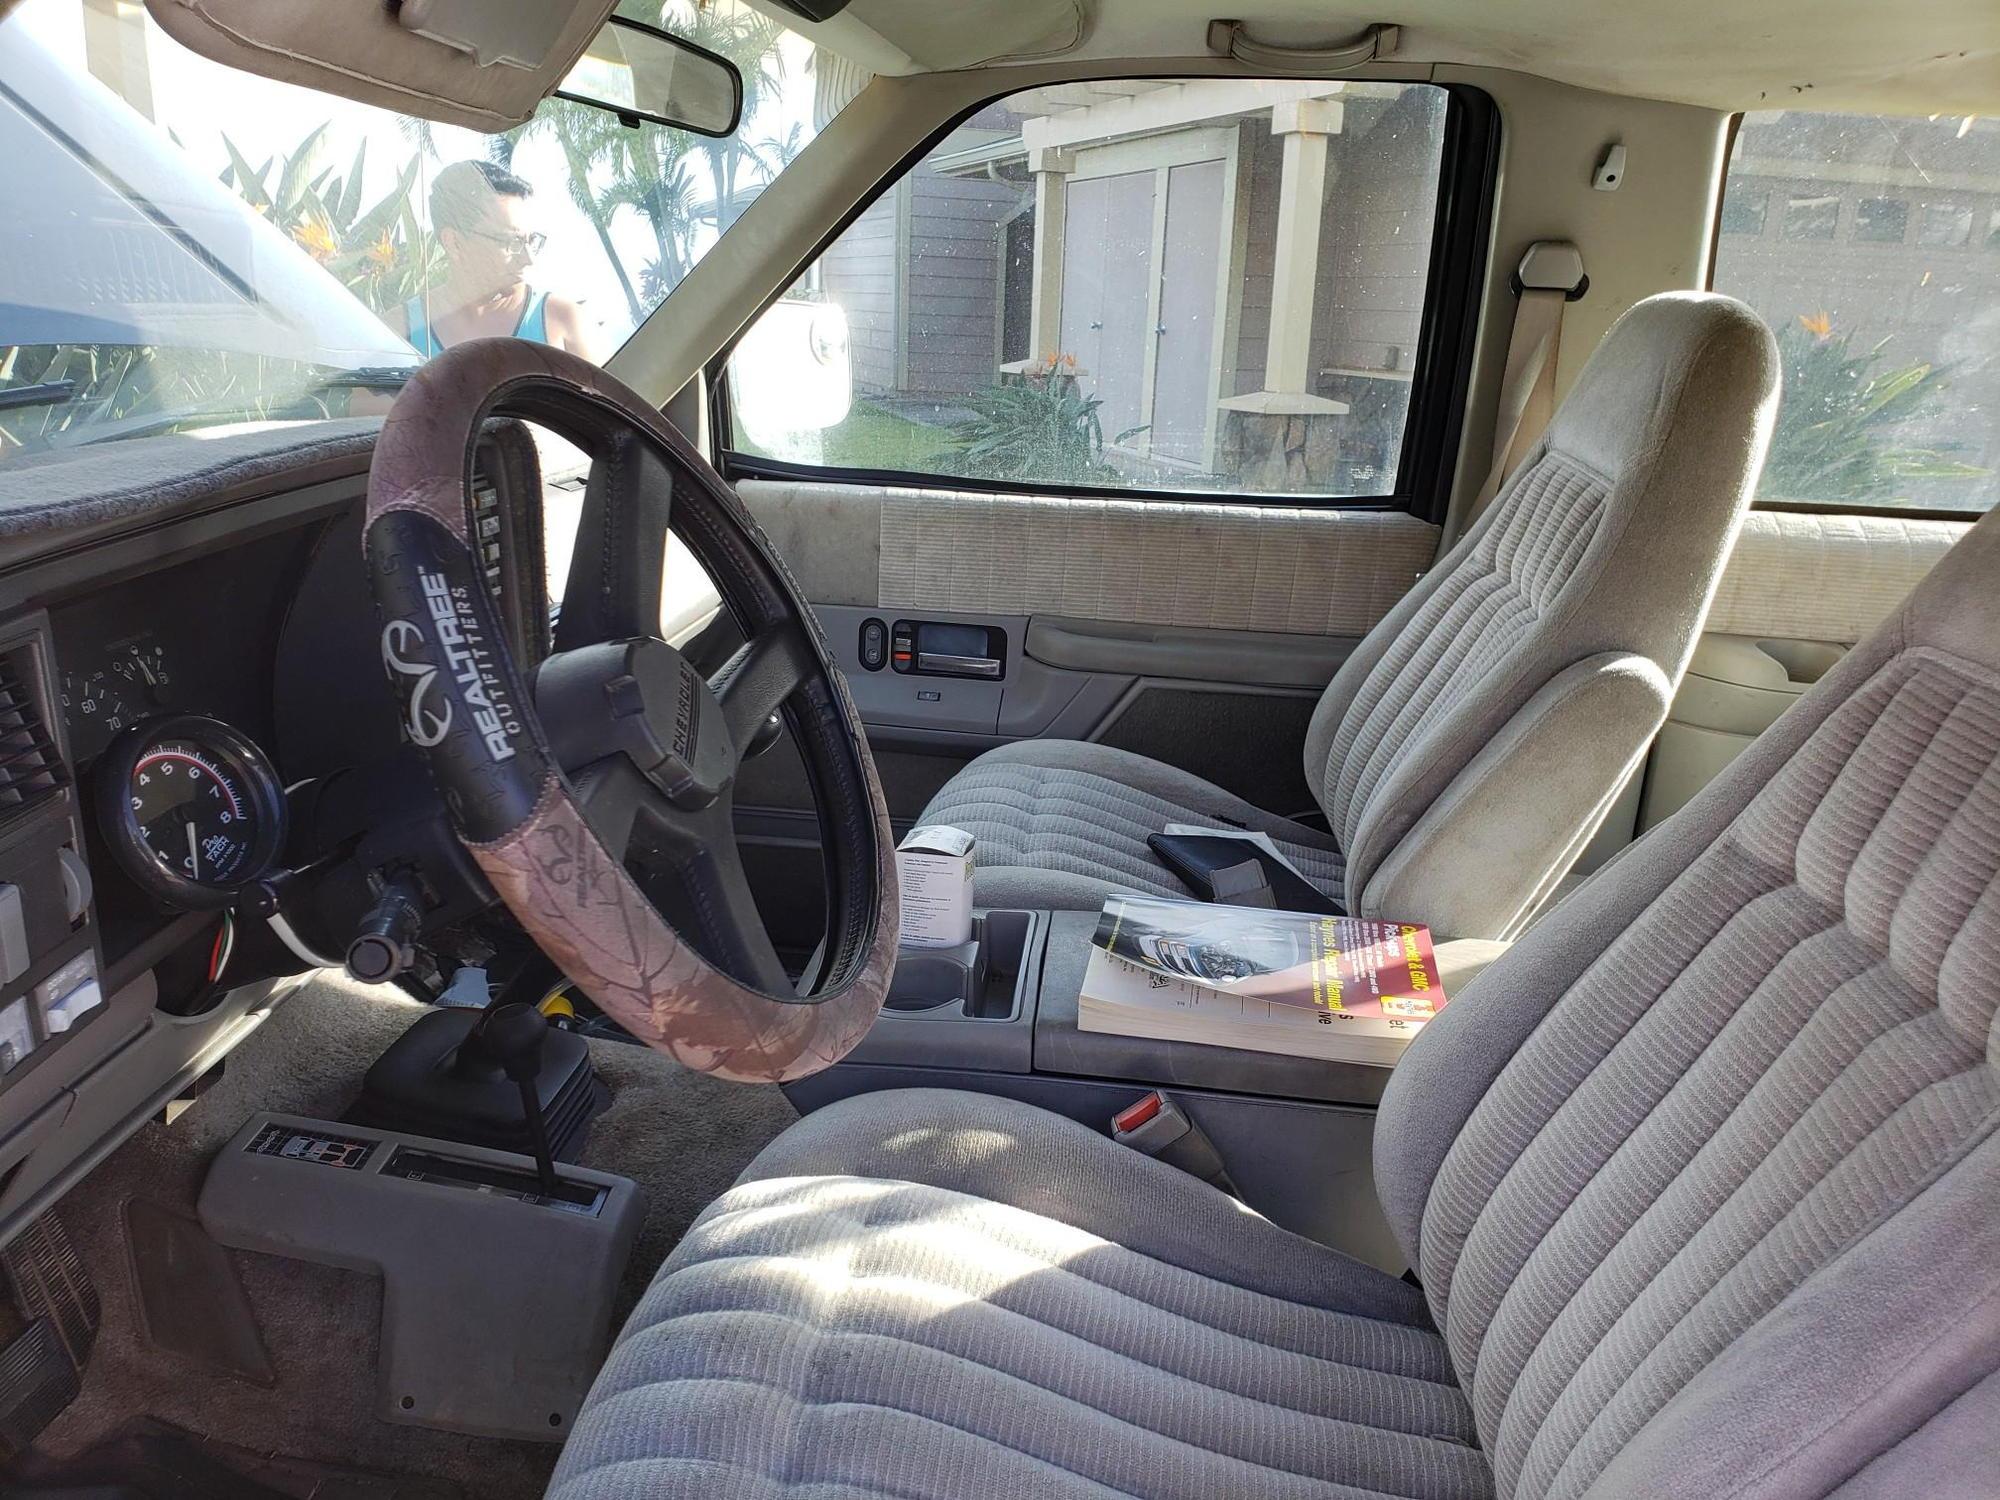 1992 chevy blazer 2dr 4x4 standard 5 7L - Blazer Forum - Chevy